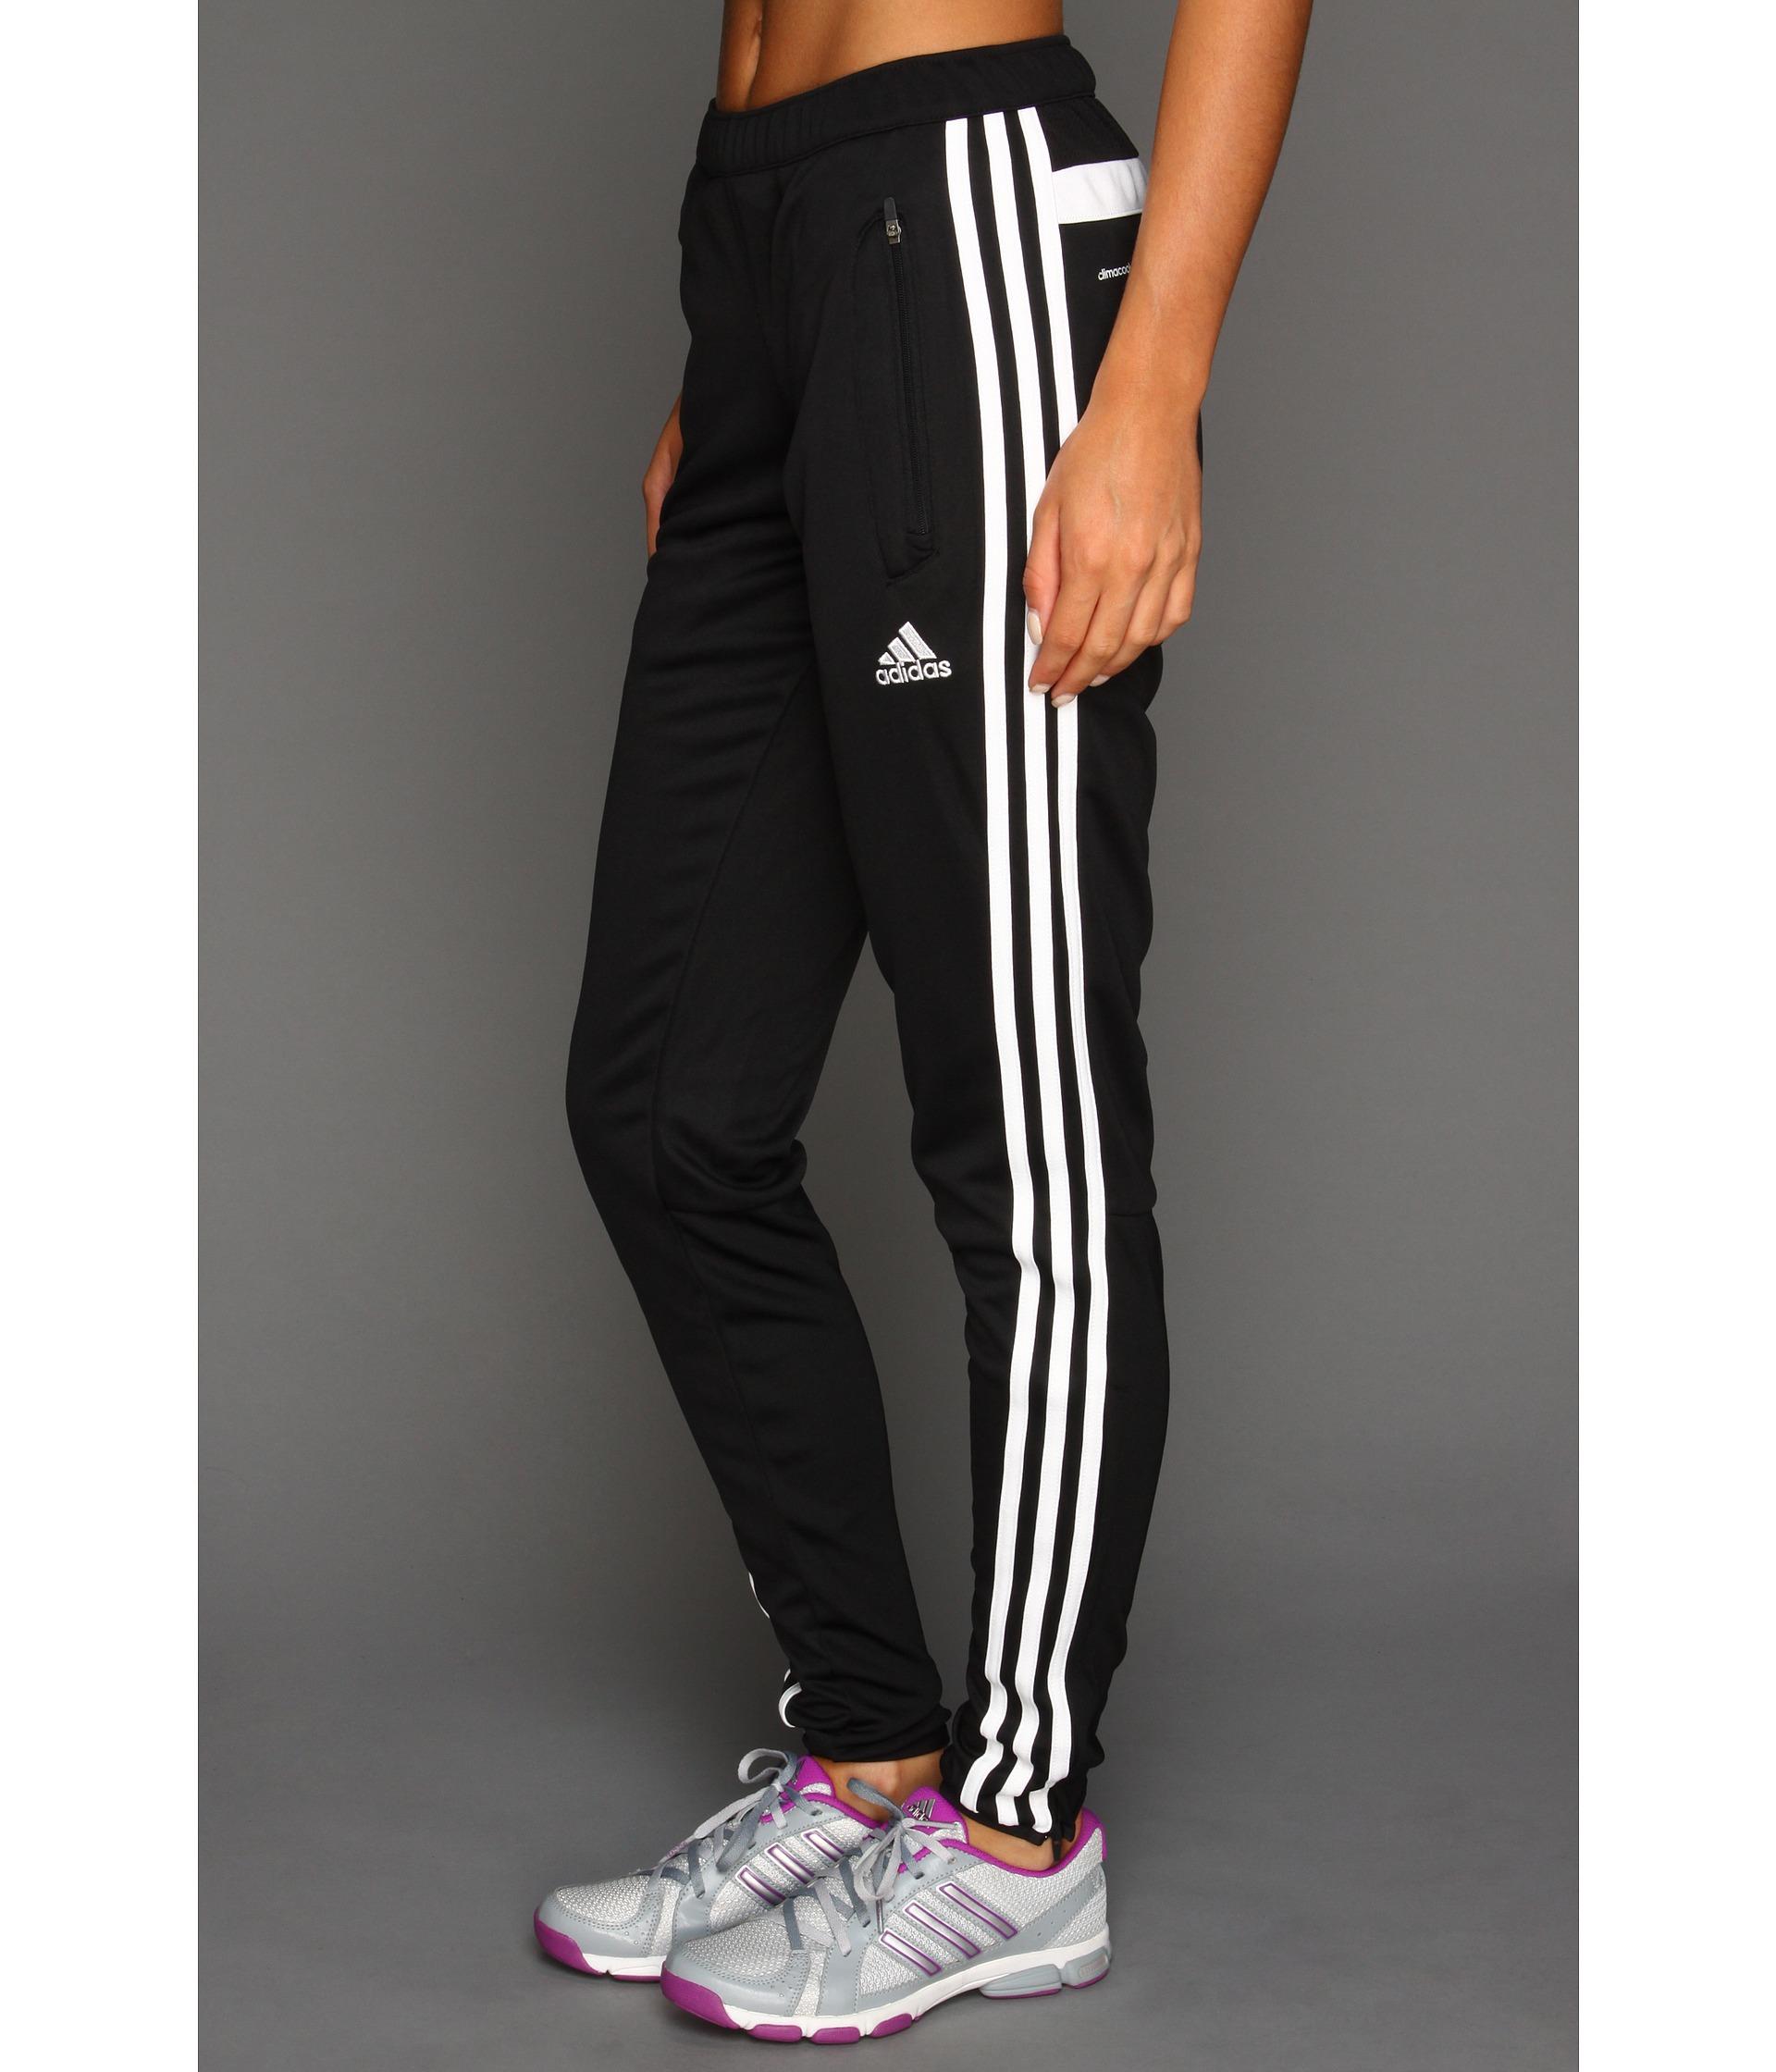 new style cecf2 6c571 adidas Tiro 13 Training Pant